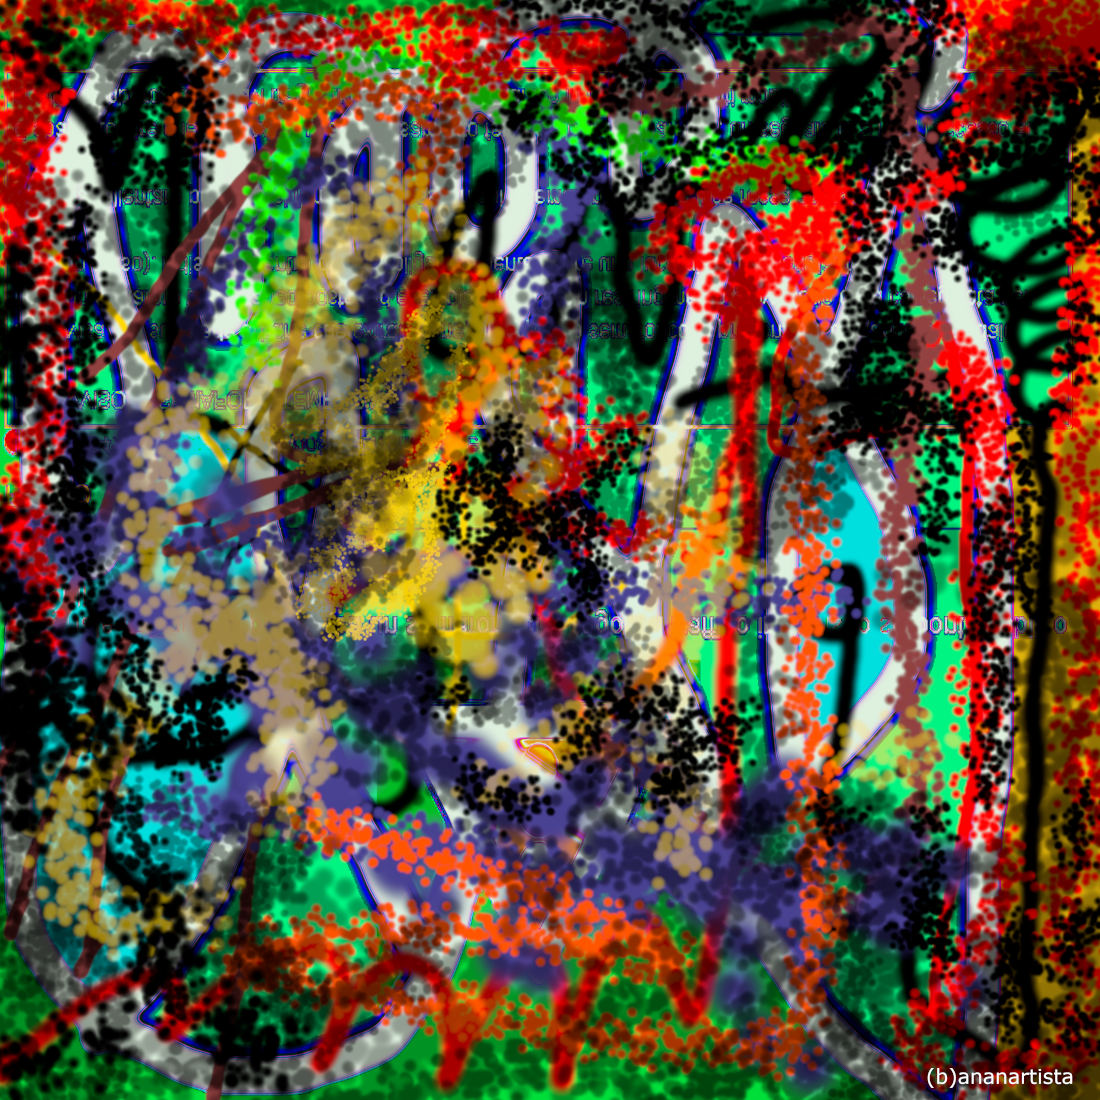 semaforo : digital art by (b)ananartista sbuff